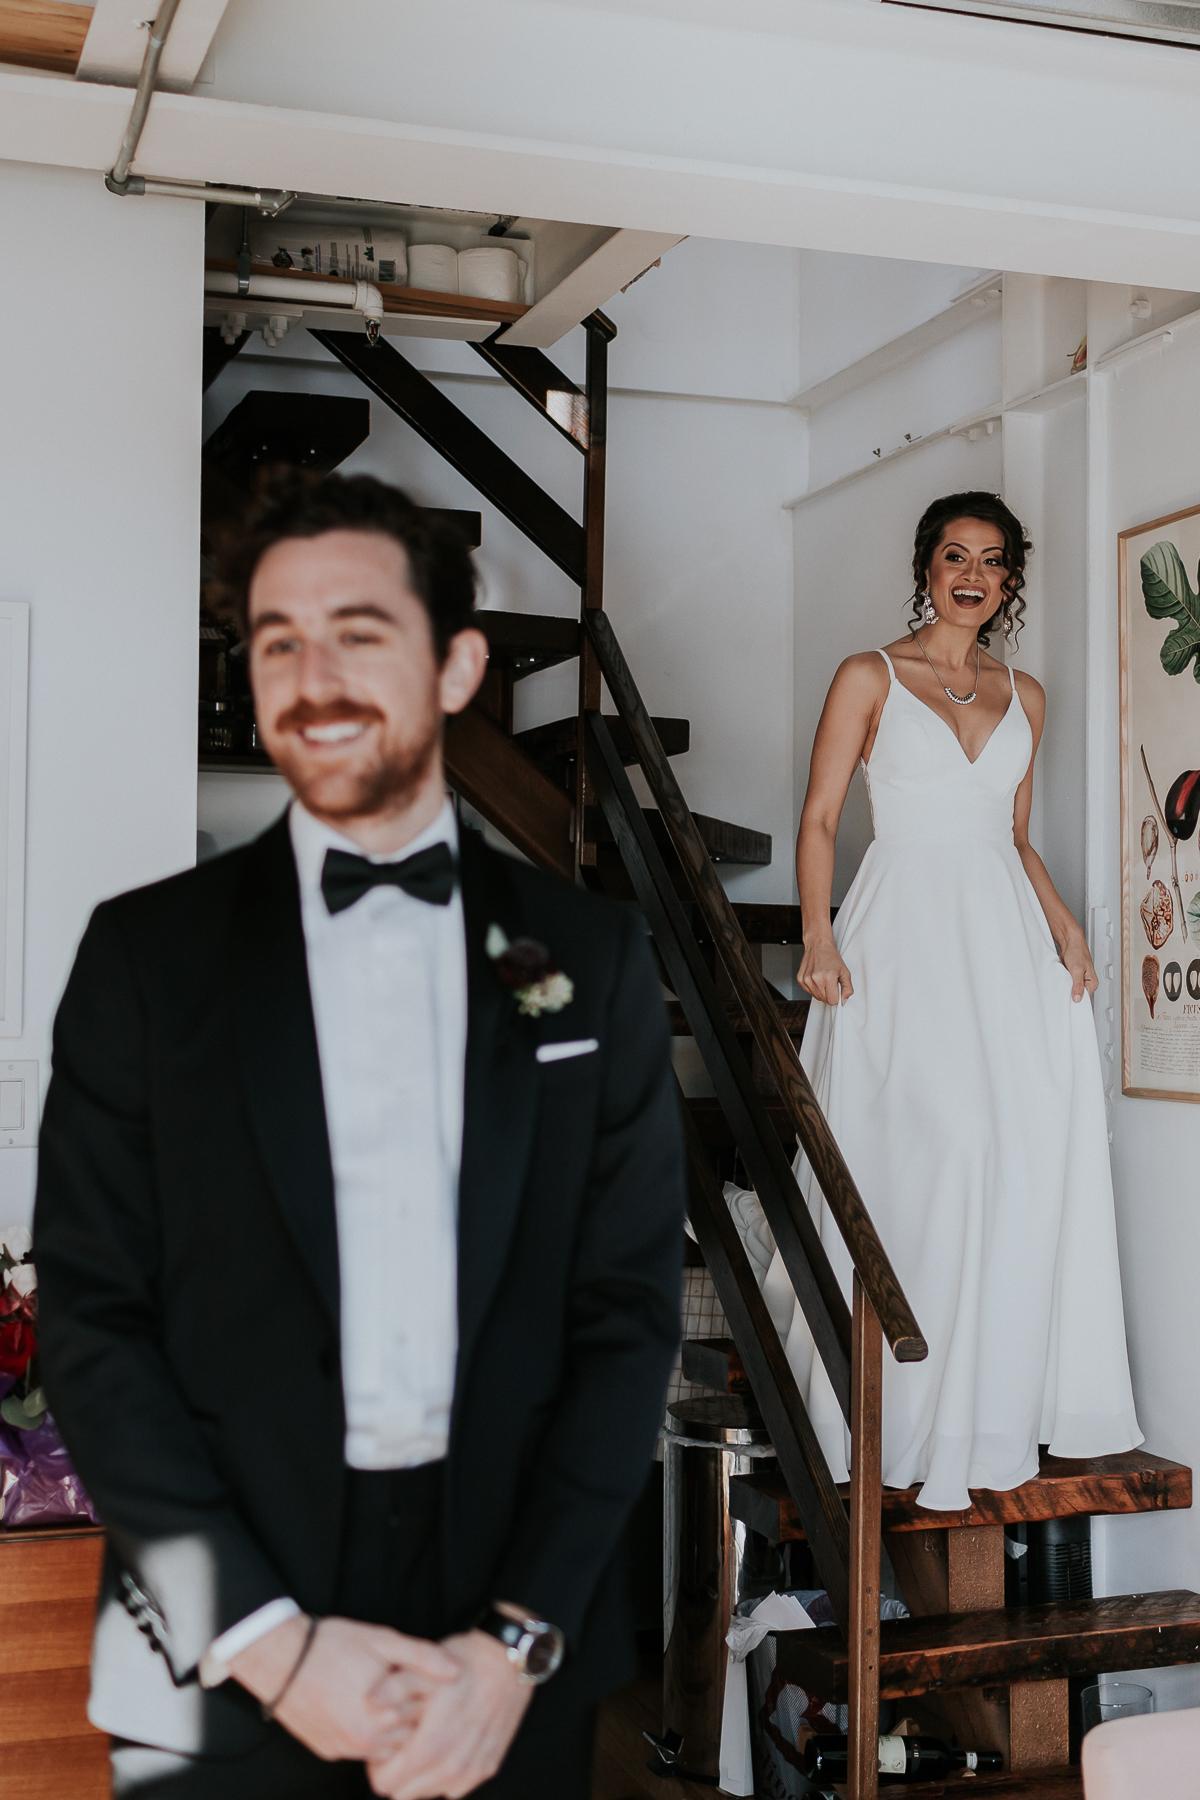 Humboldt-&-Jackson-Restaurant-Intimate-Brooklyn-Documentary-Wedding-Photographer-8.jpg